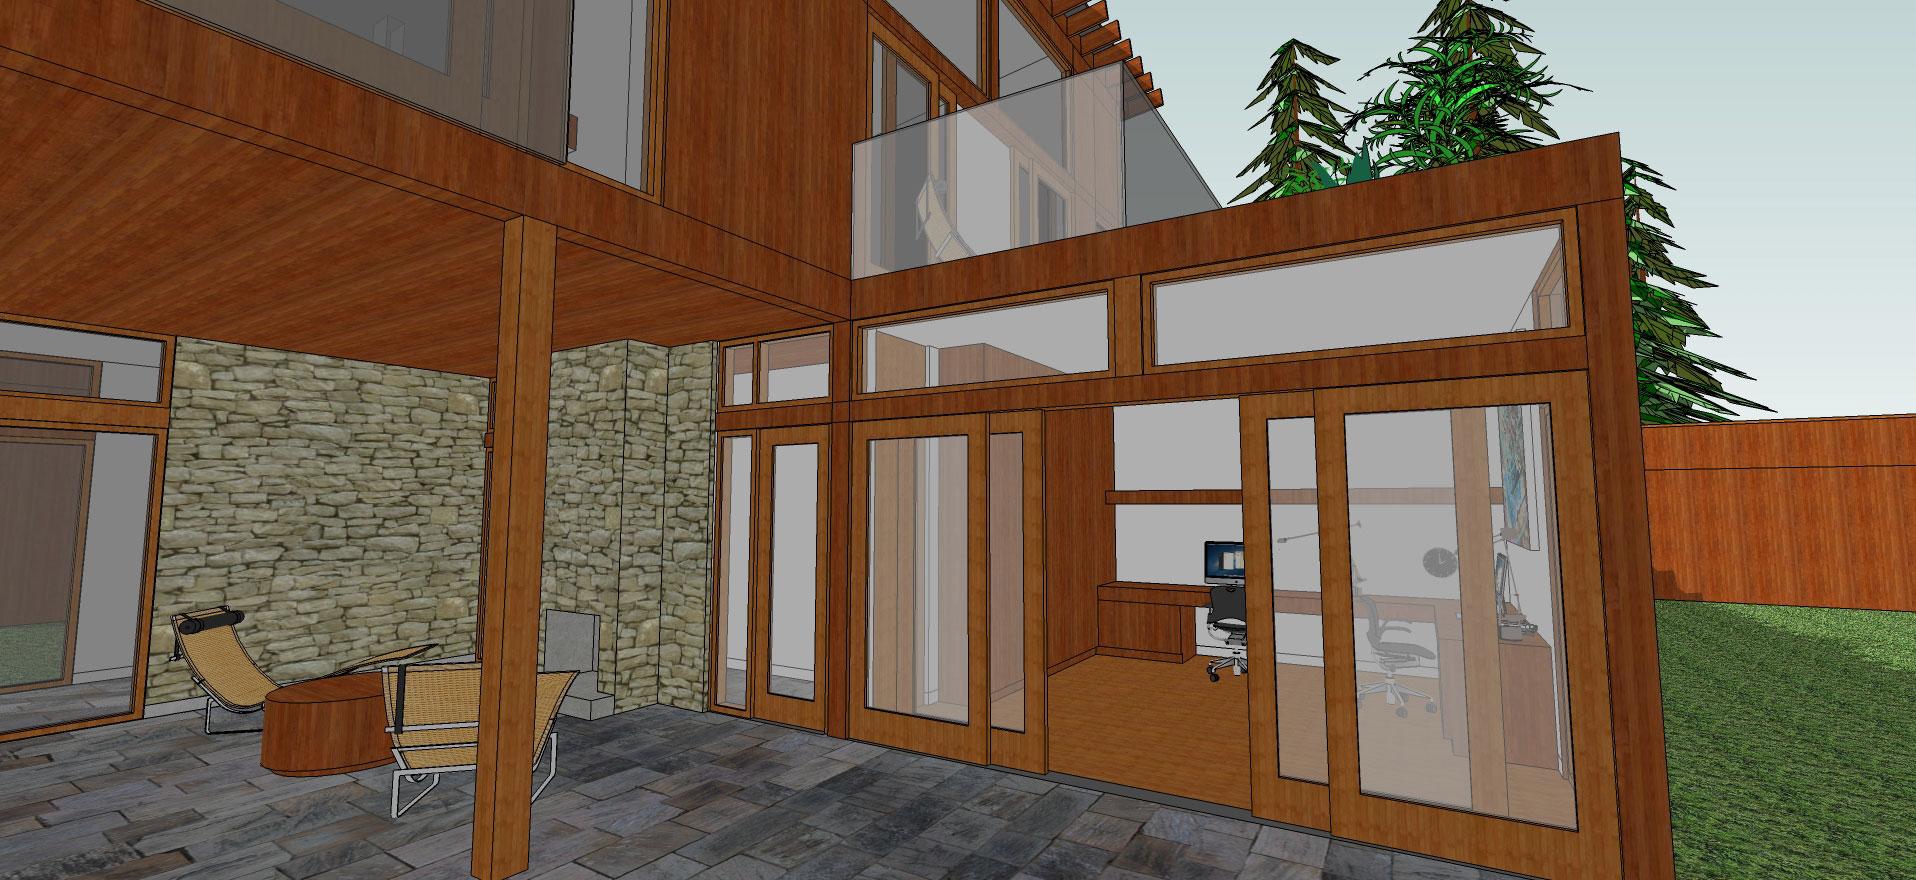 exterior office/outdoor room